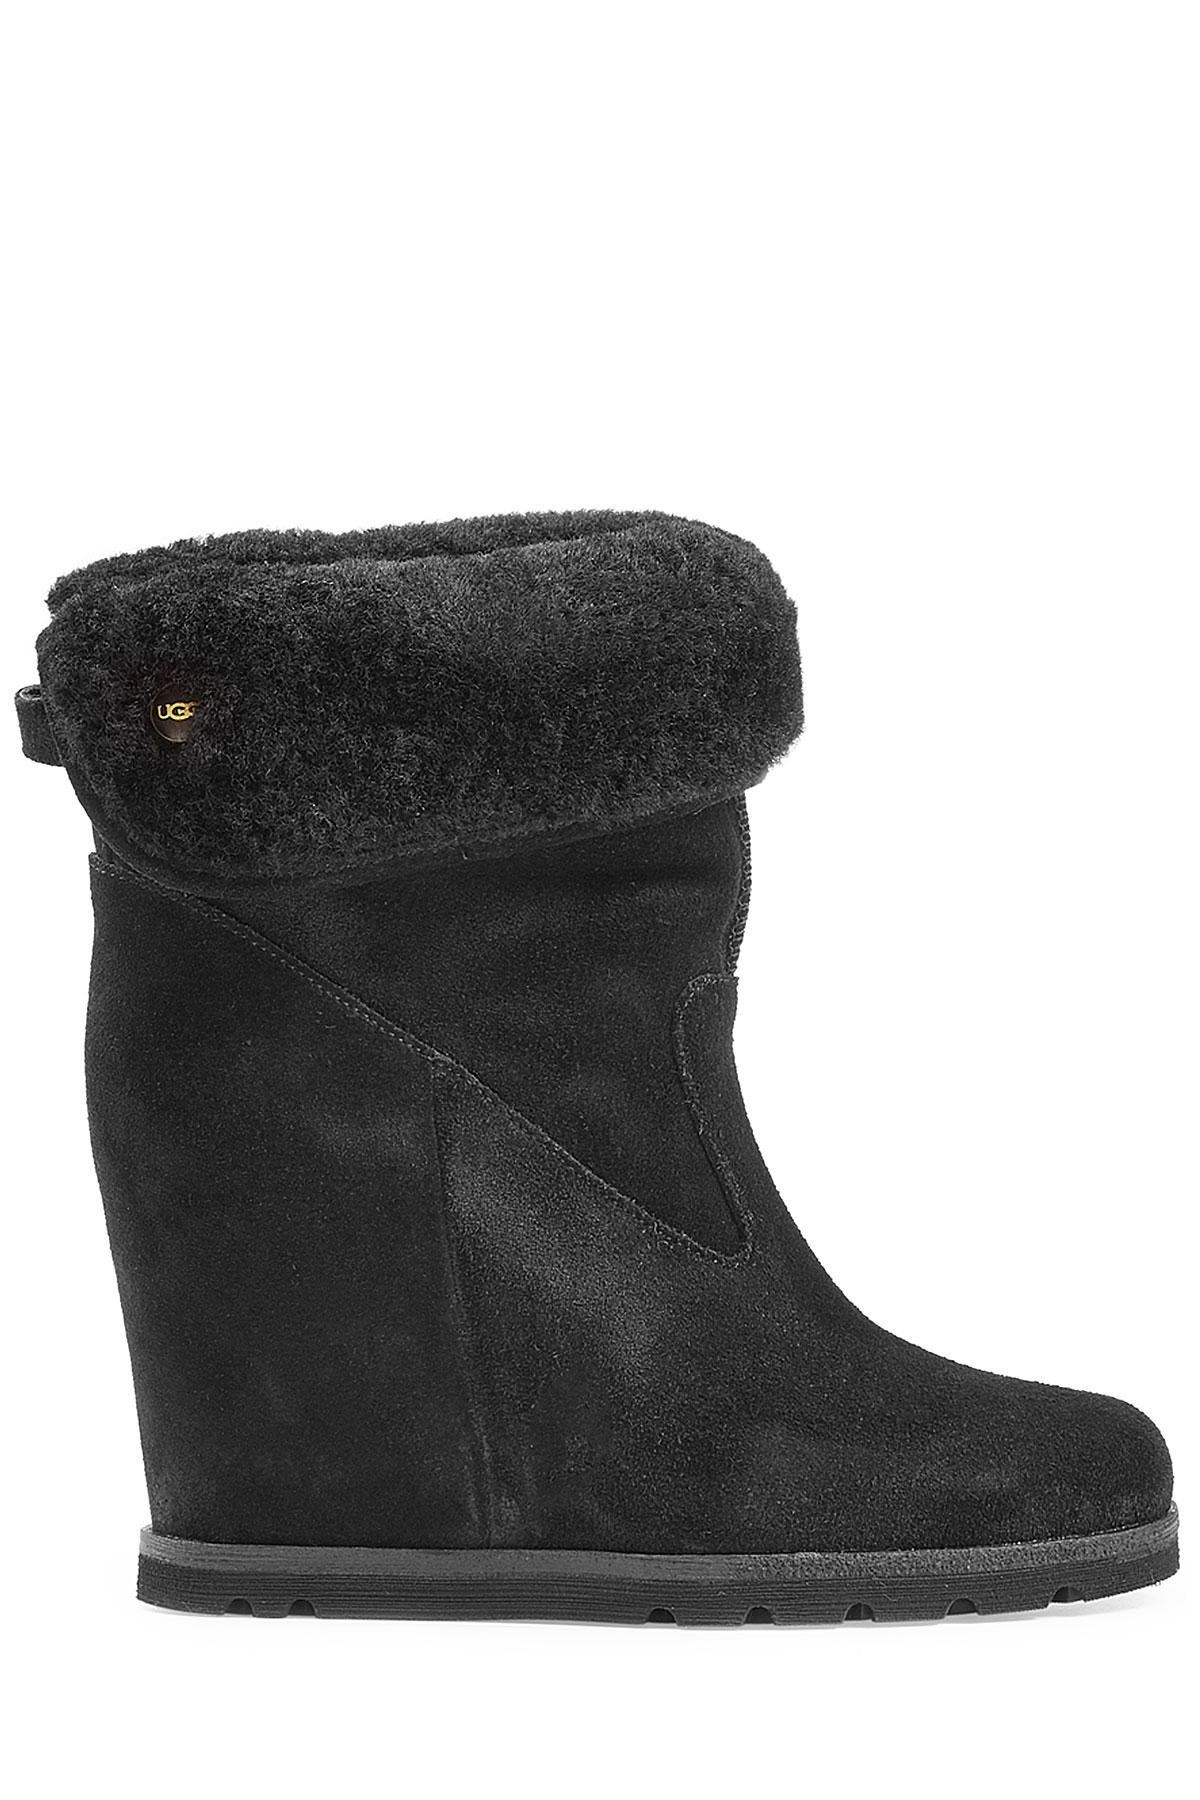 Ugg Kyra Concealed Wedge Suede Boots Black In Black Lyst